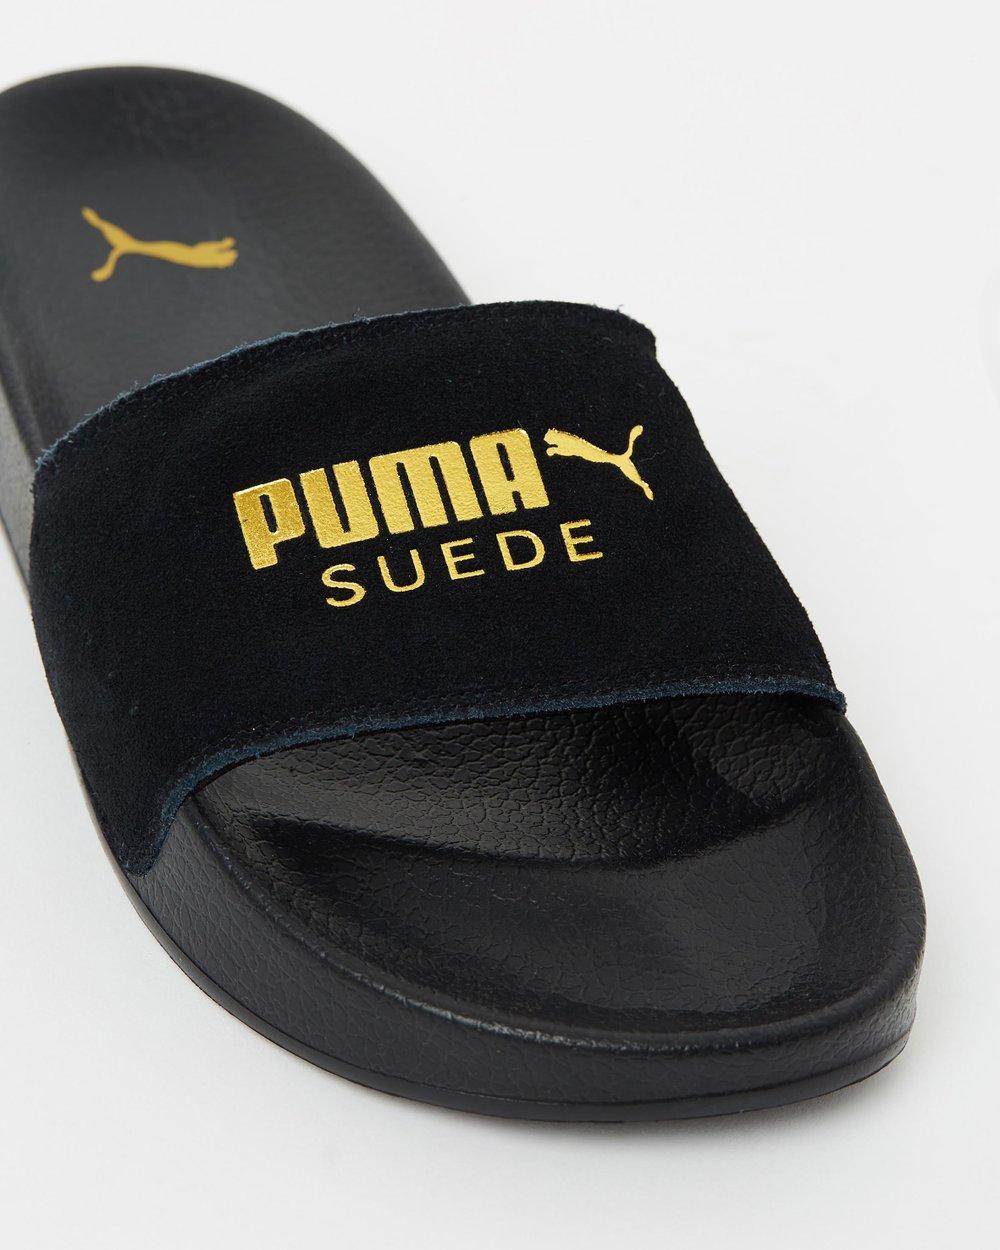 96f171d8dab Leadcat Suede Slides - Women s by Puma Online